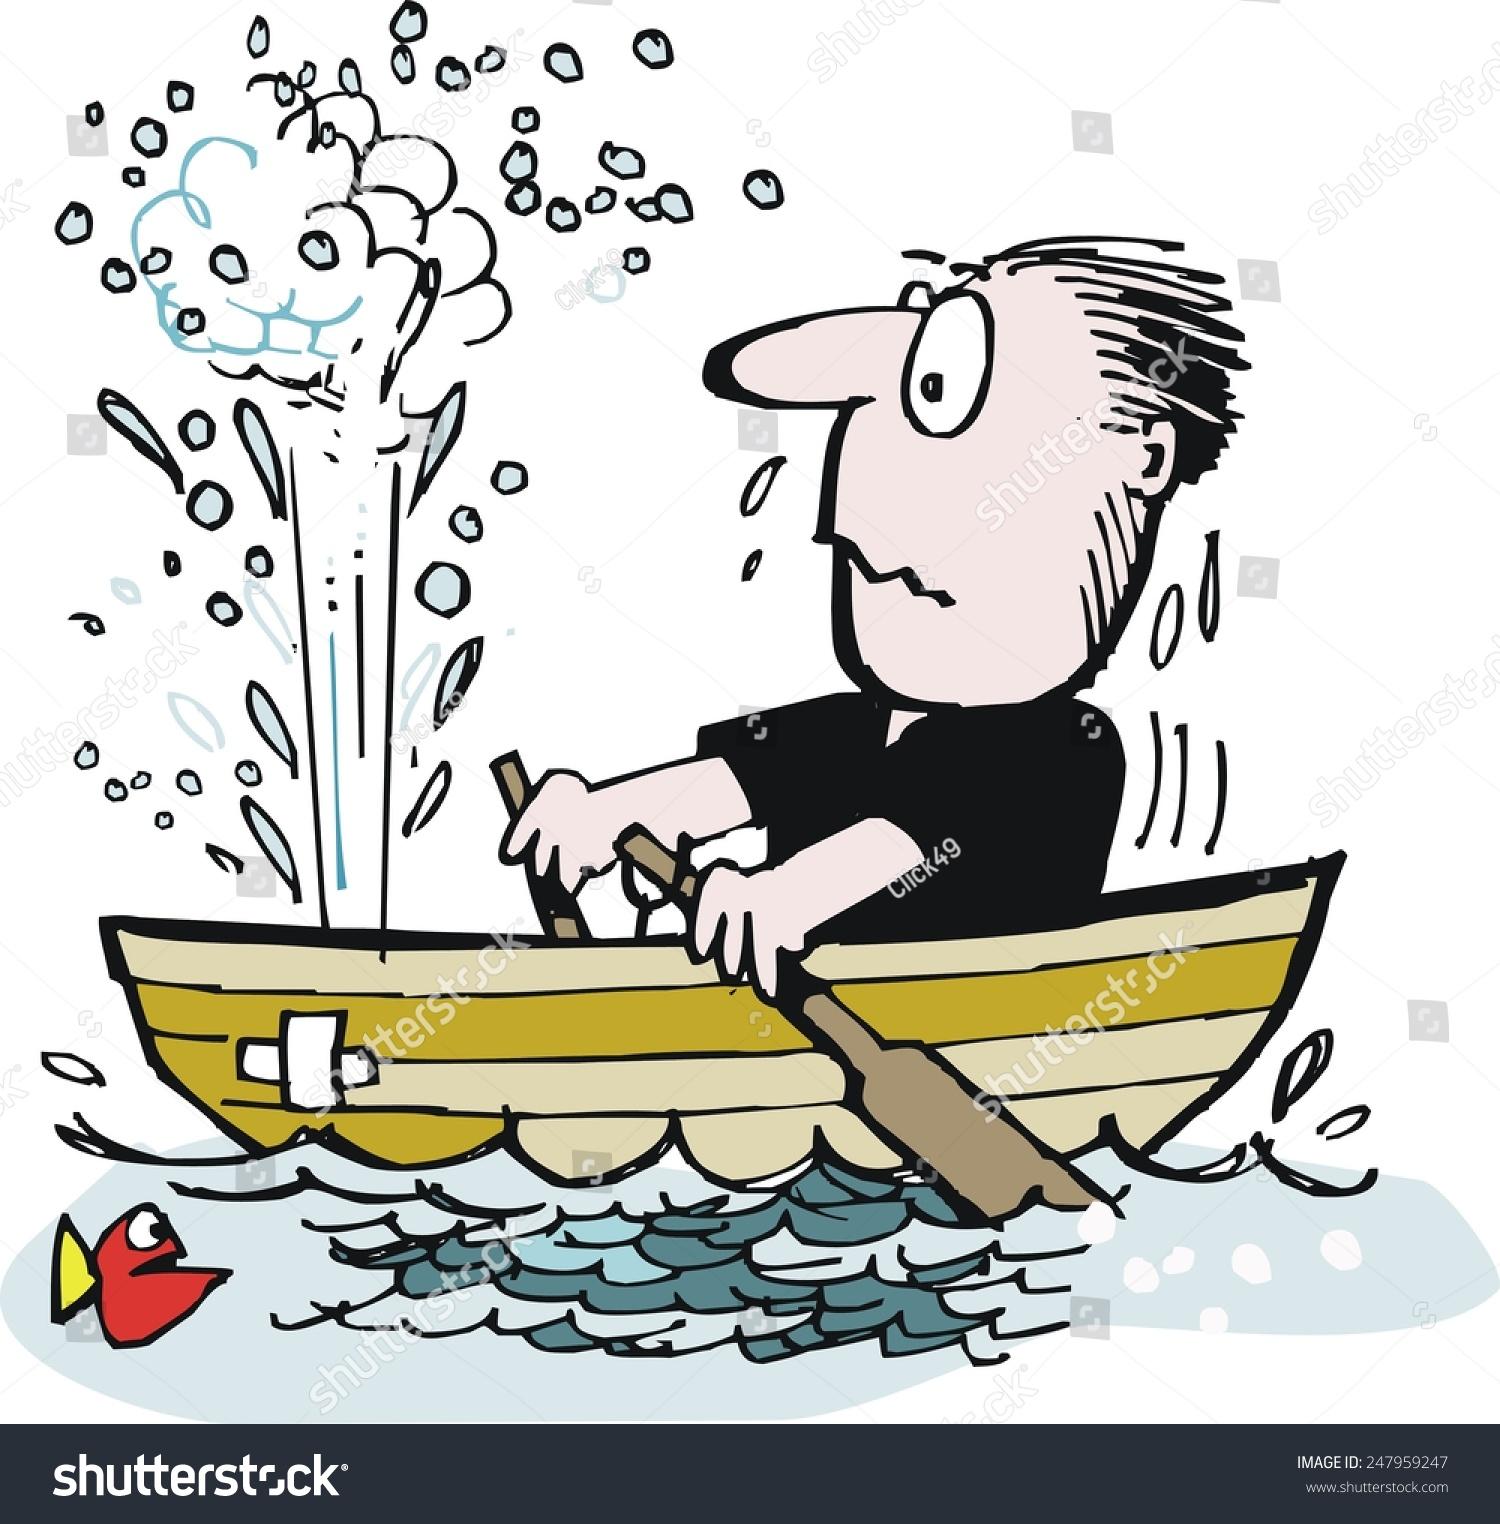 Vector cartoon of man trying to row leaky boat in ocean